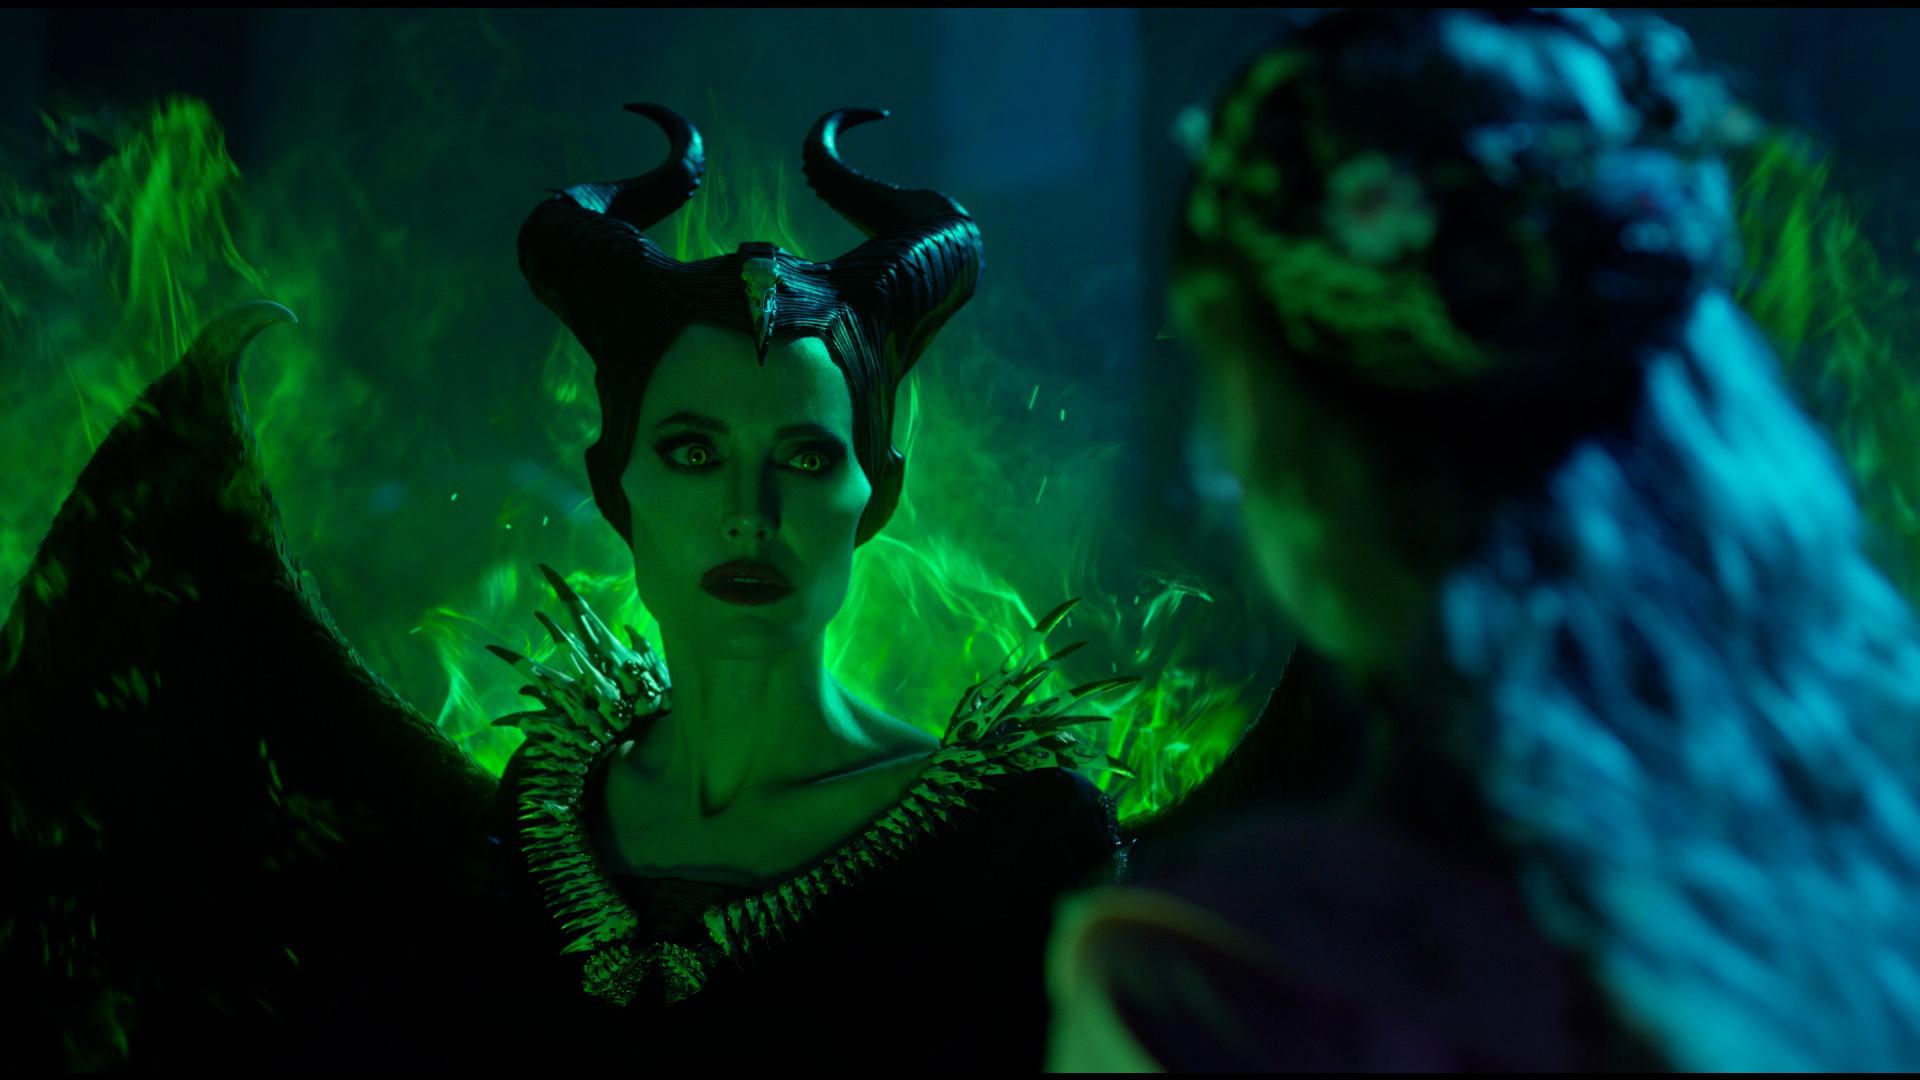 Maleficentj9HVlYLIpBOAd